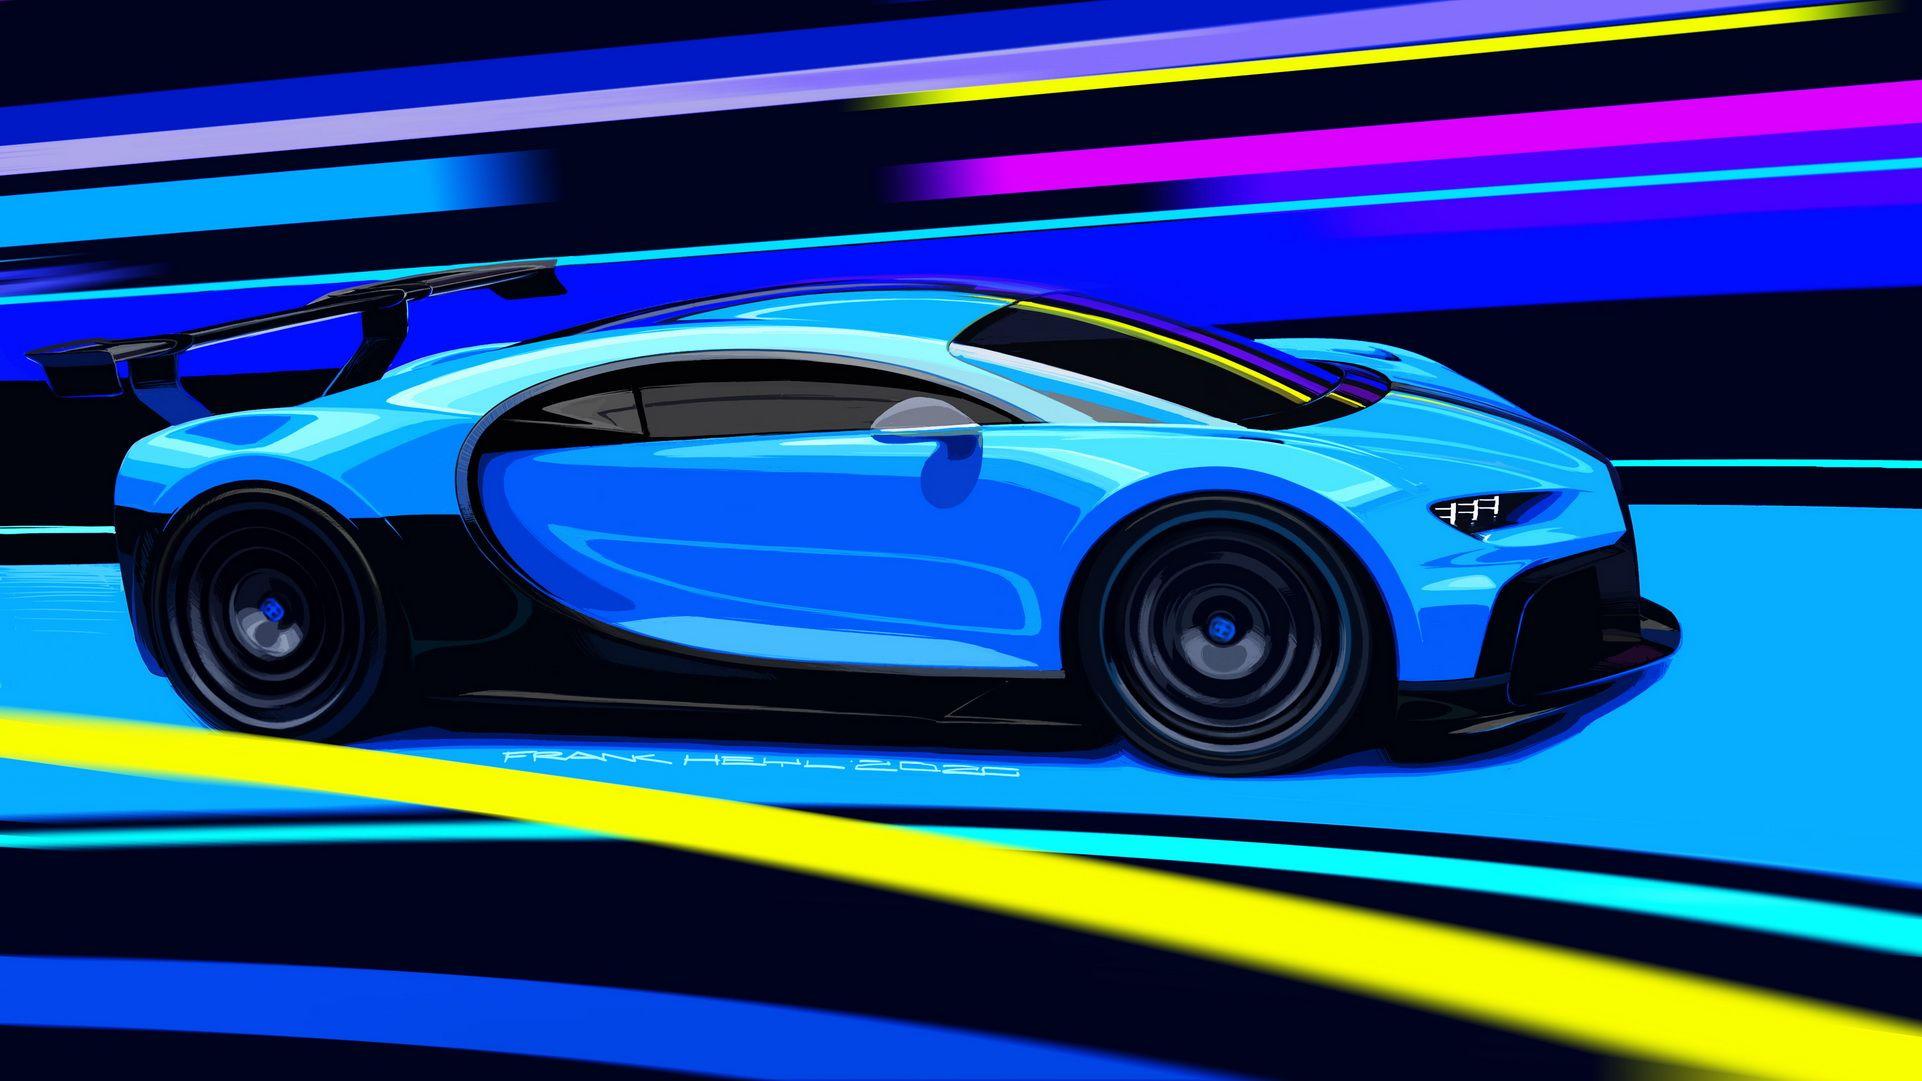 New Bugatti Chiron Pur Sport Breaks Cover With Aero Upgrades Stiffer Suspension Updated Carscoops Bugatti Chiron New Bugatti Chiron Bugatti